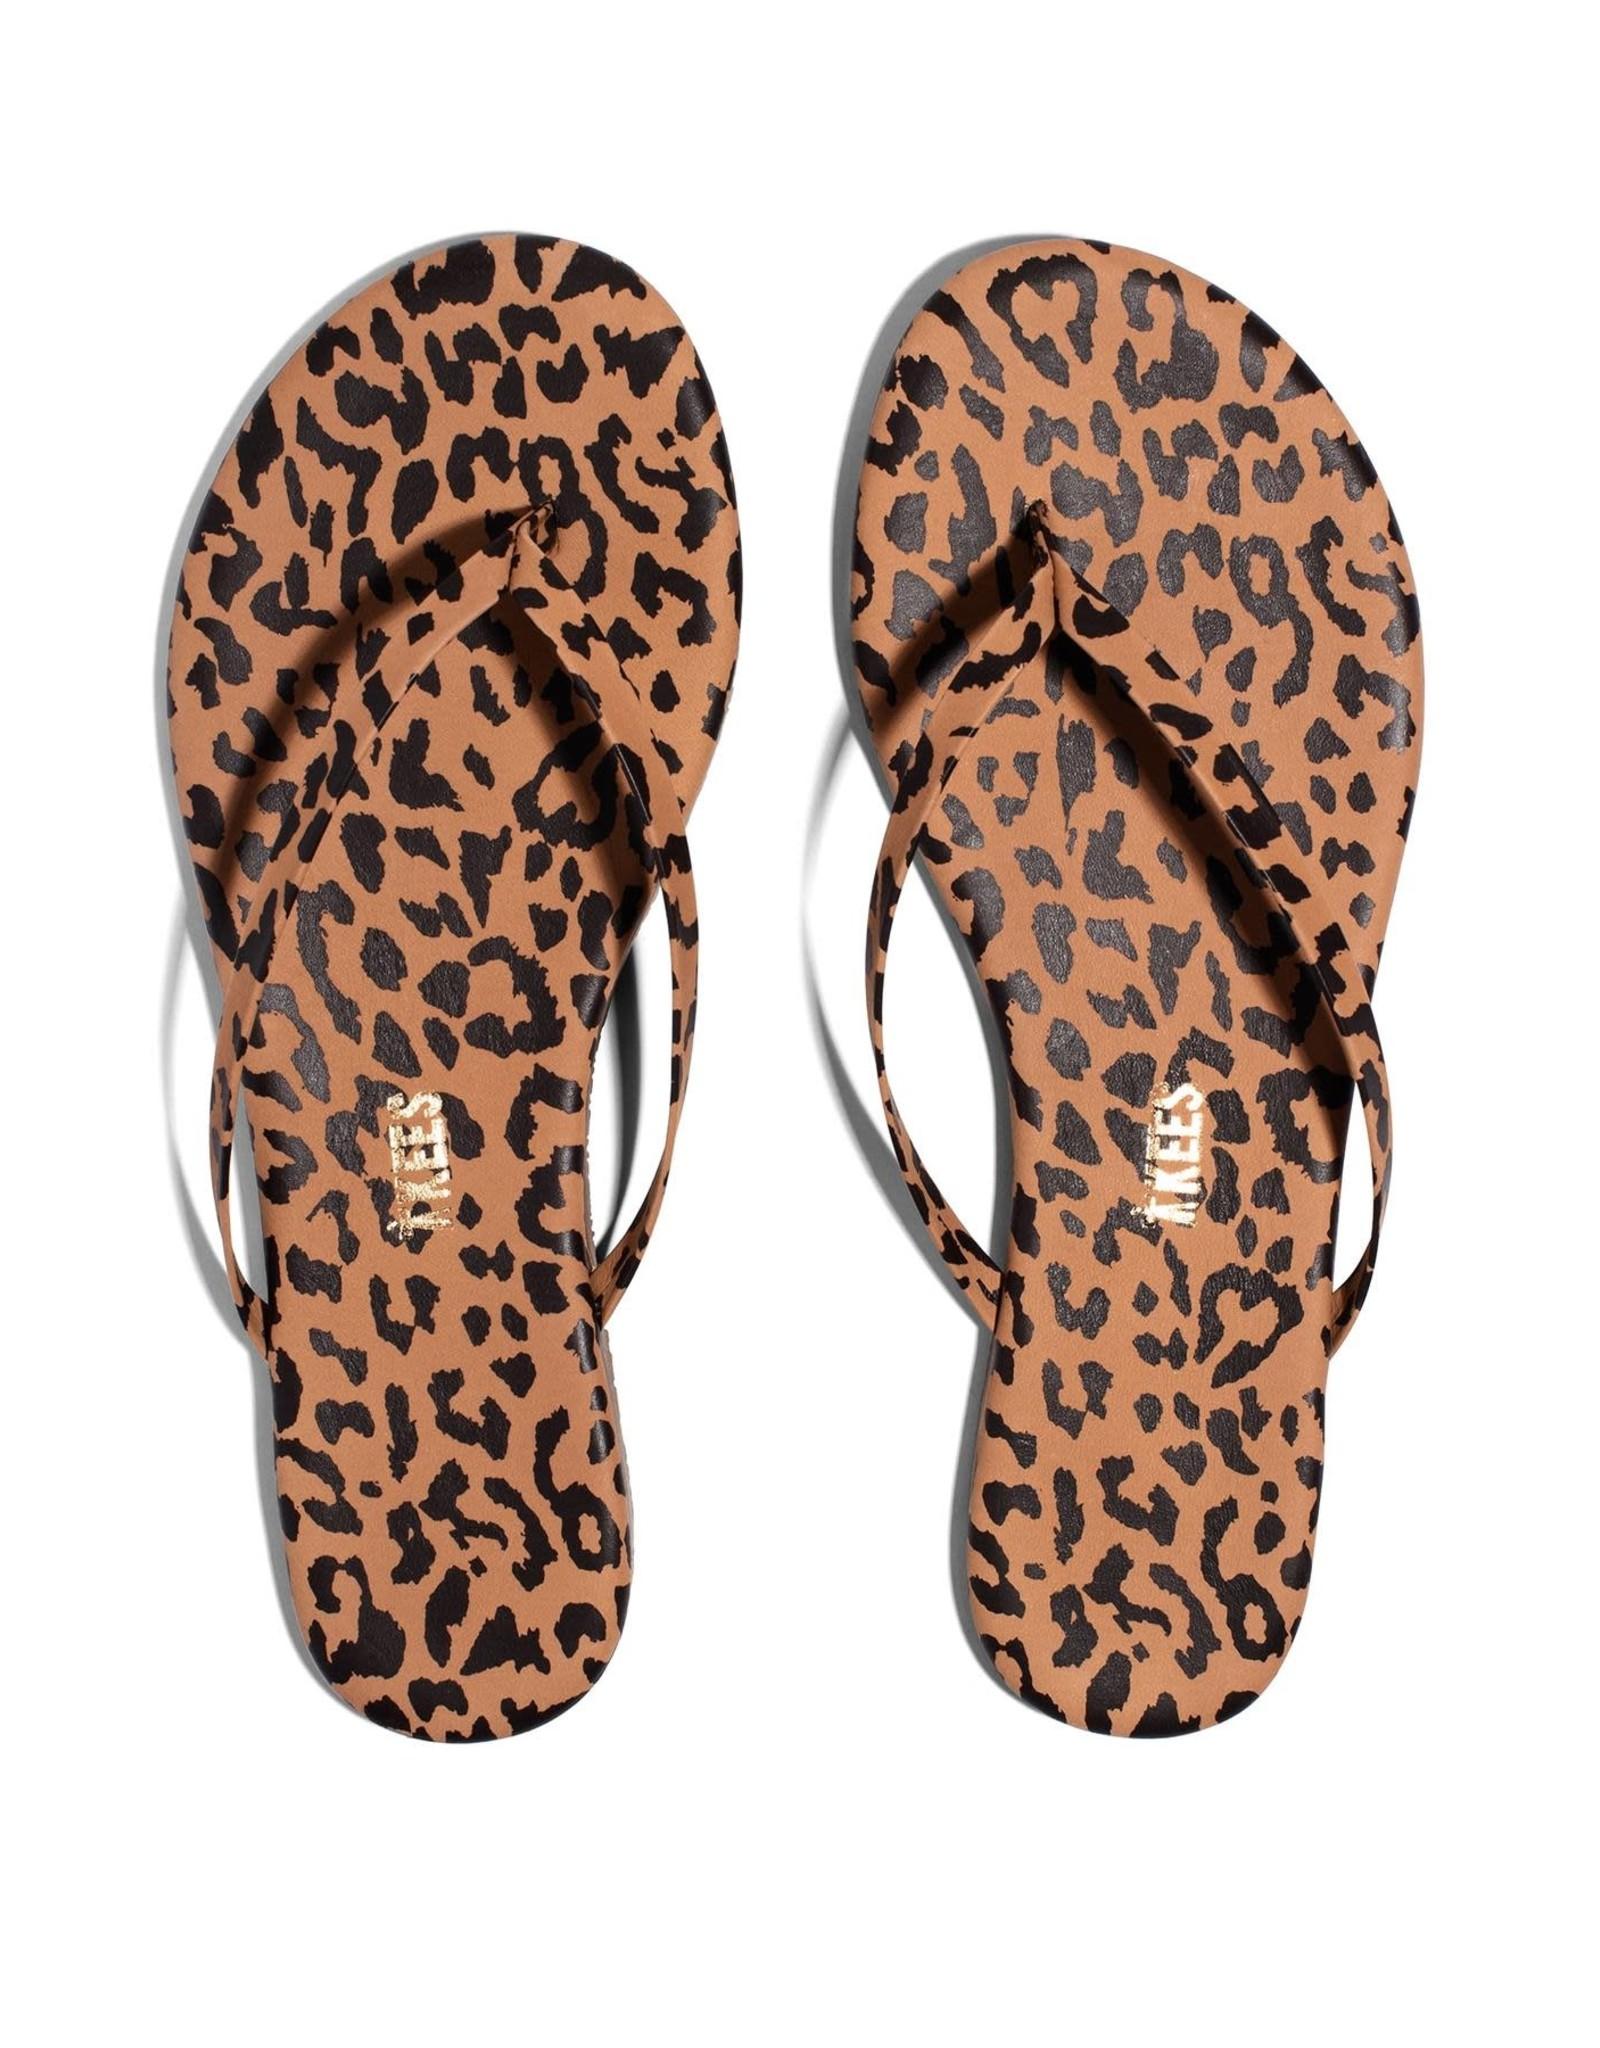 $2,117 MXN Tkees Studio Exotics Cheetah Sandals